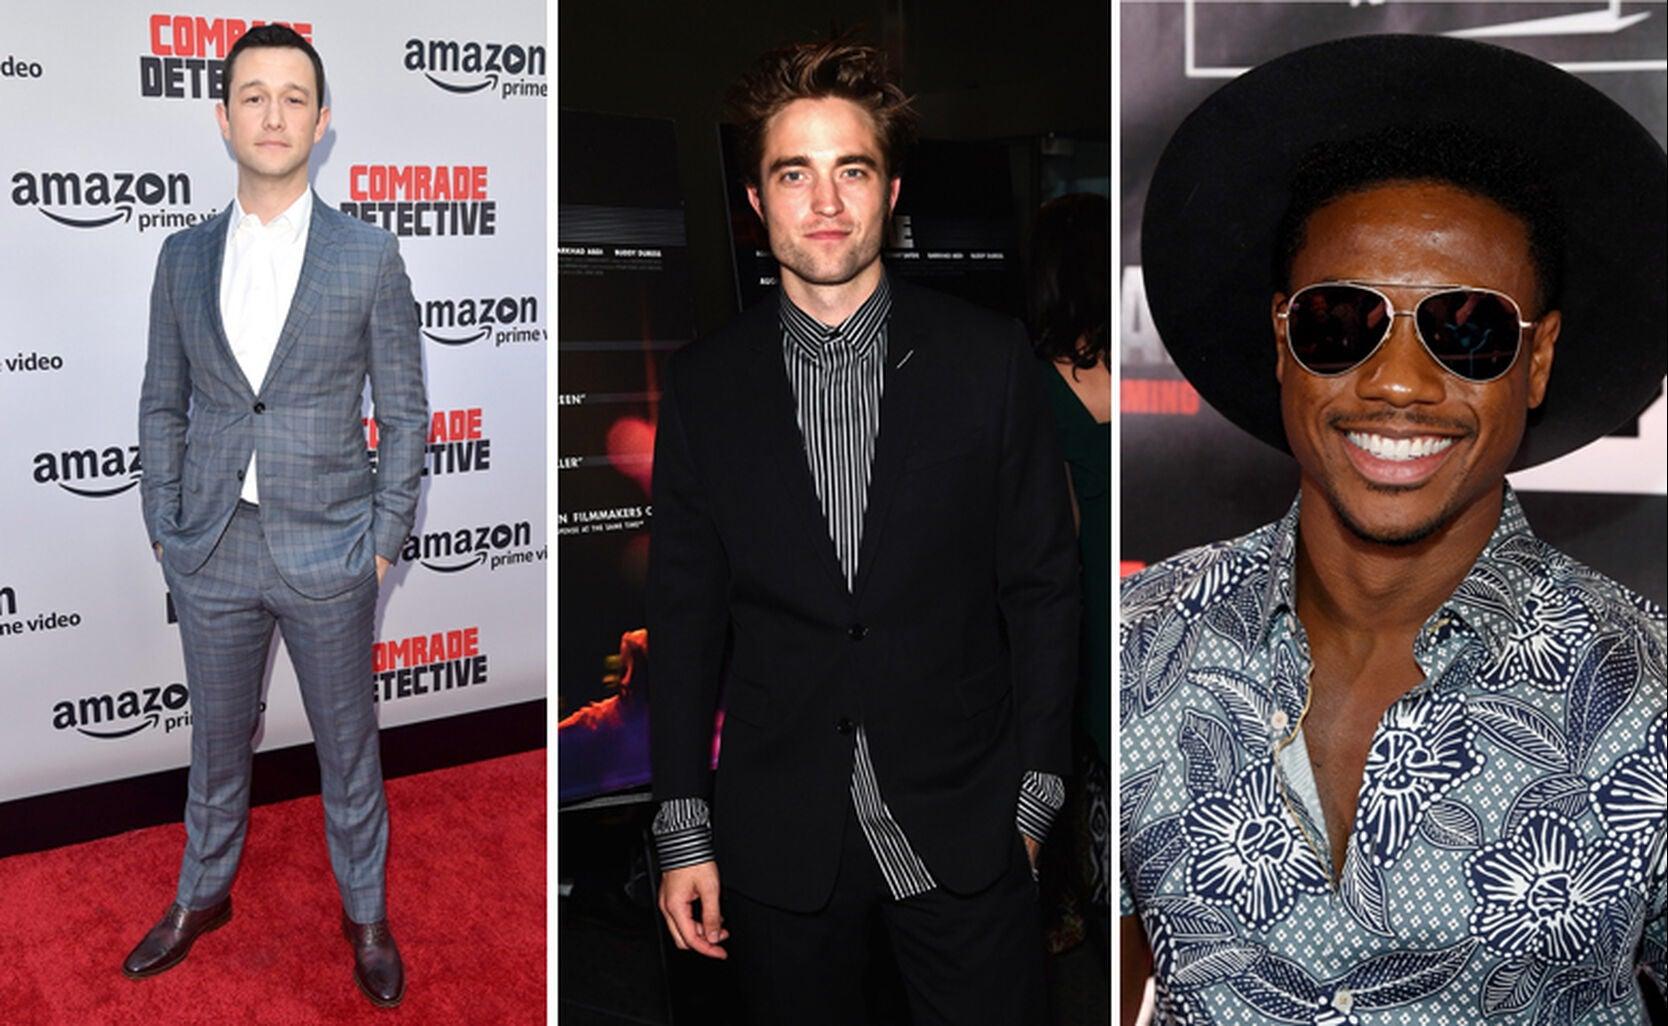 Joseph Gordon Levitt, Shamar Philippe and Robert Pattinson